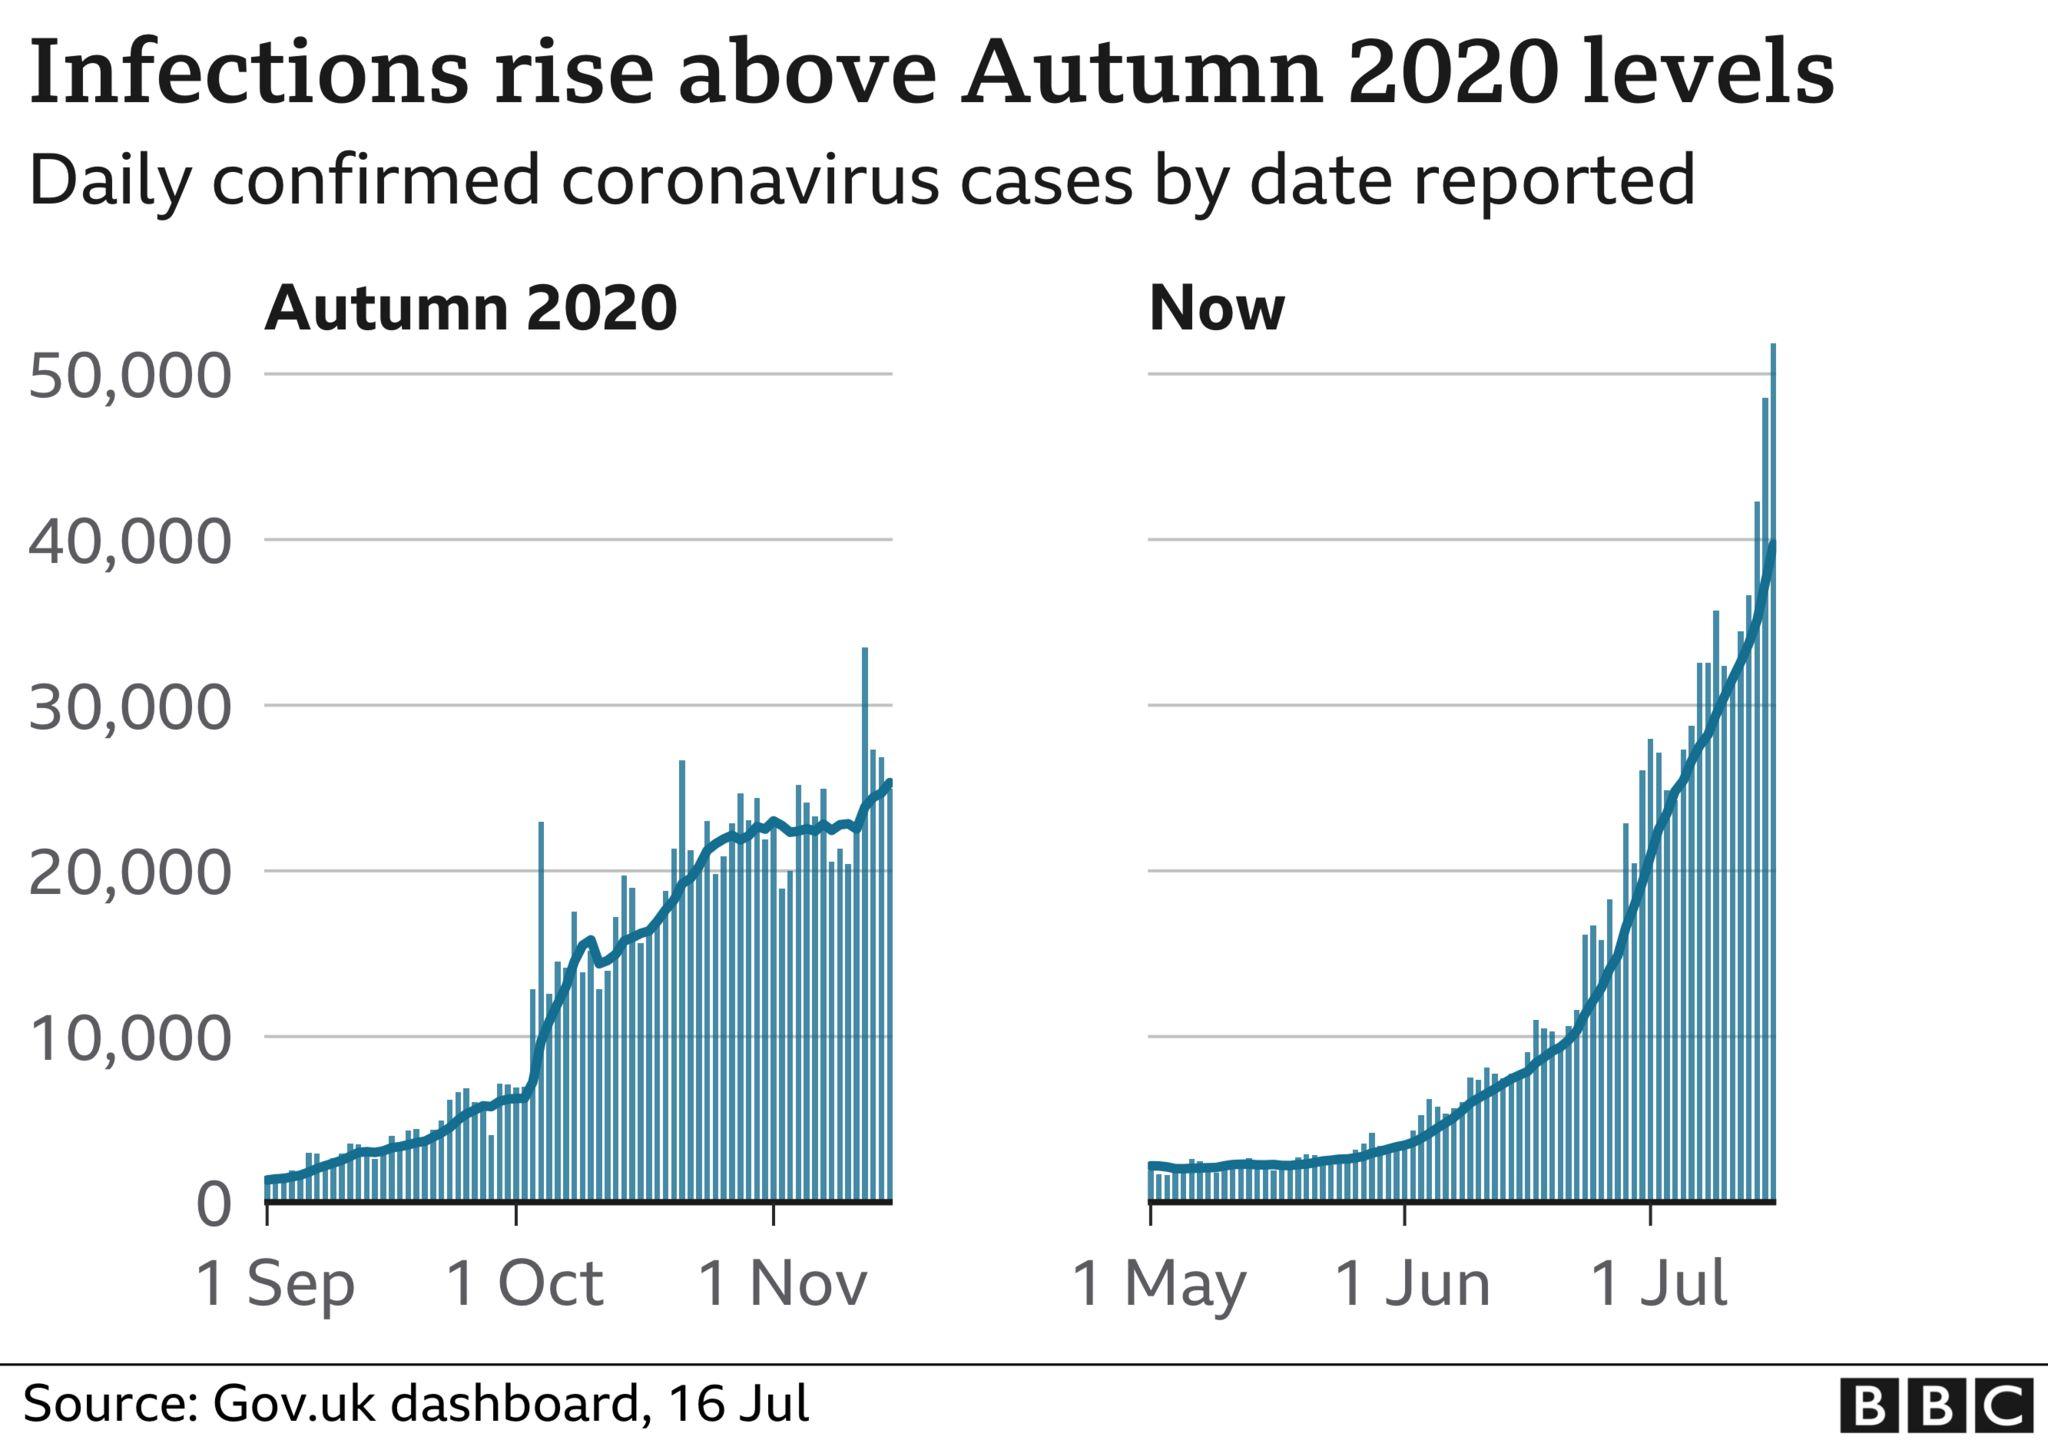 Number of coronavirus cases compared to autumn 2020